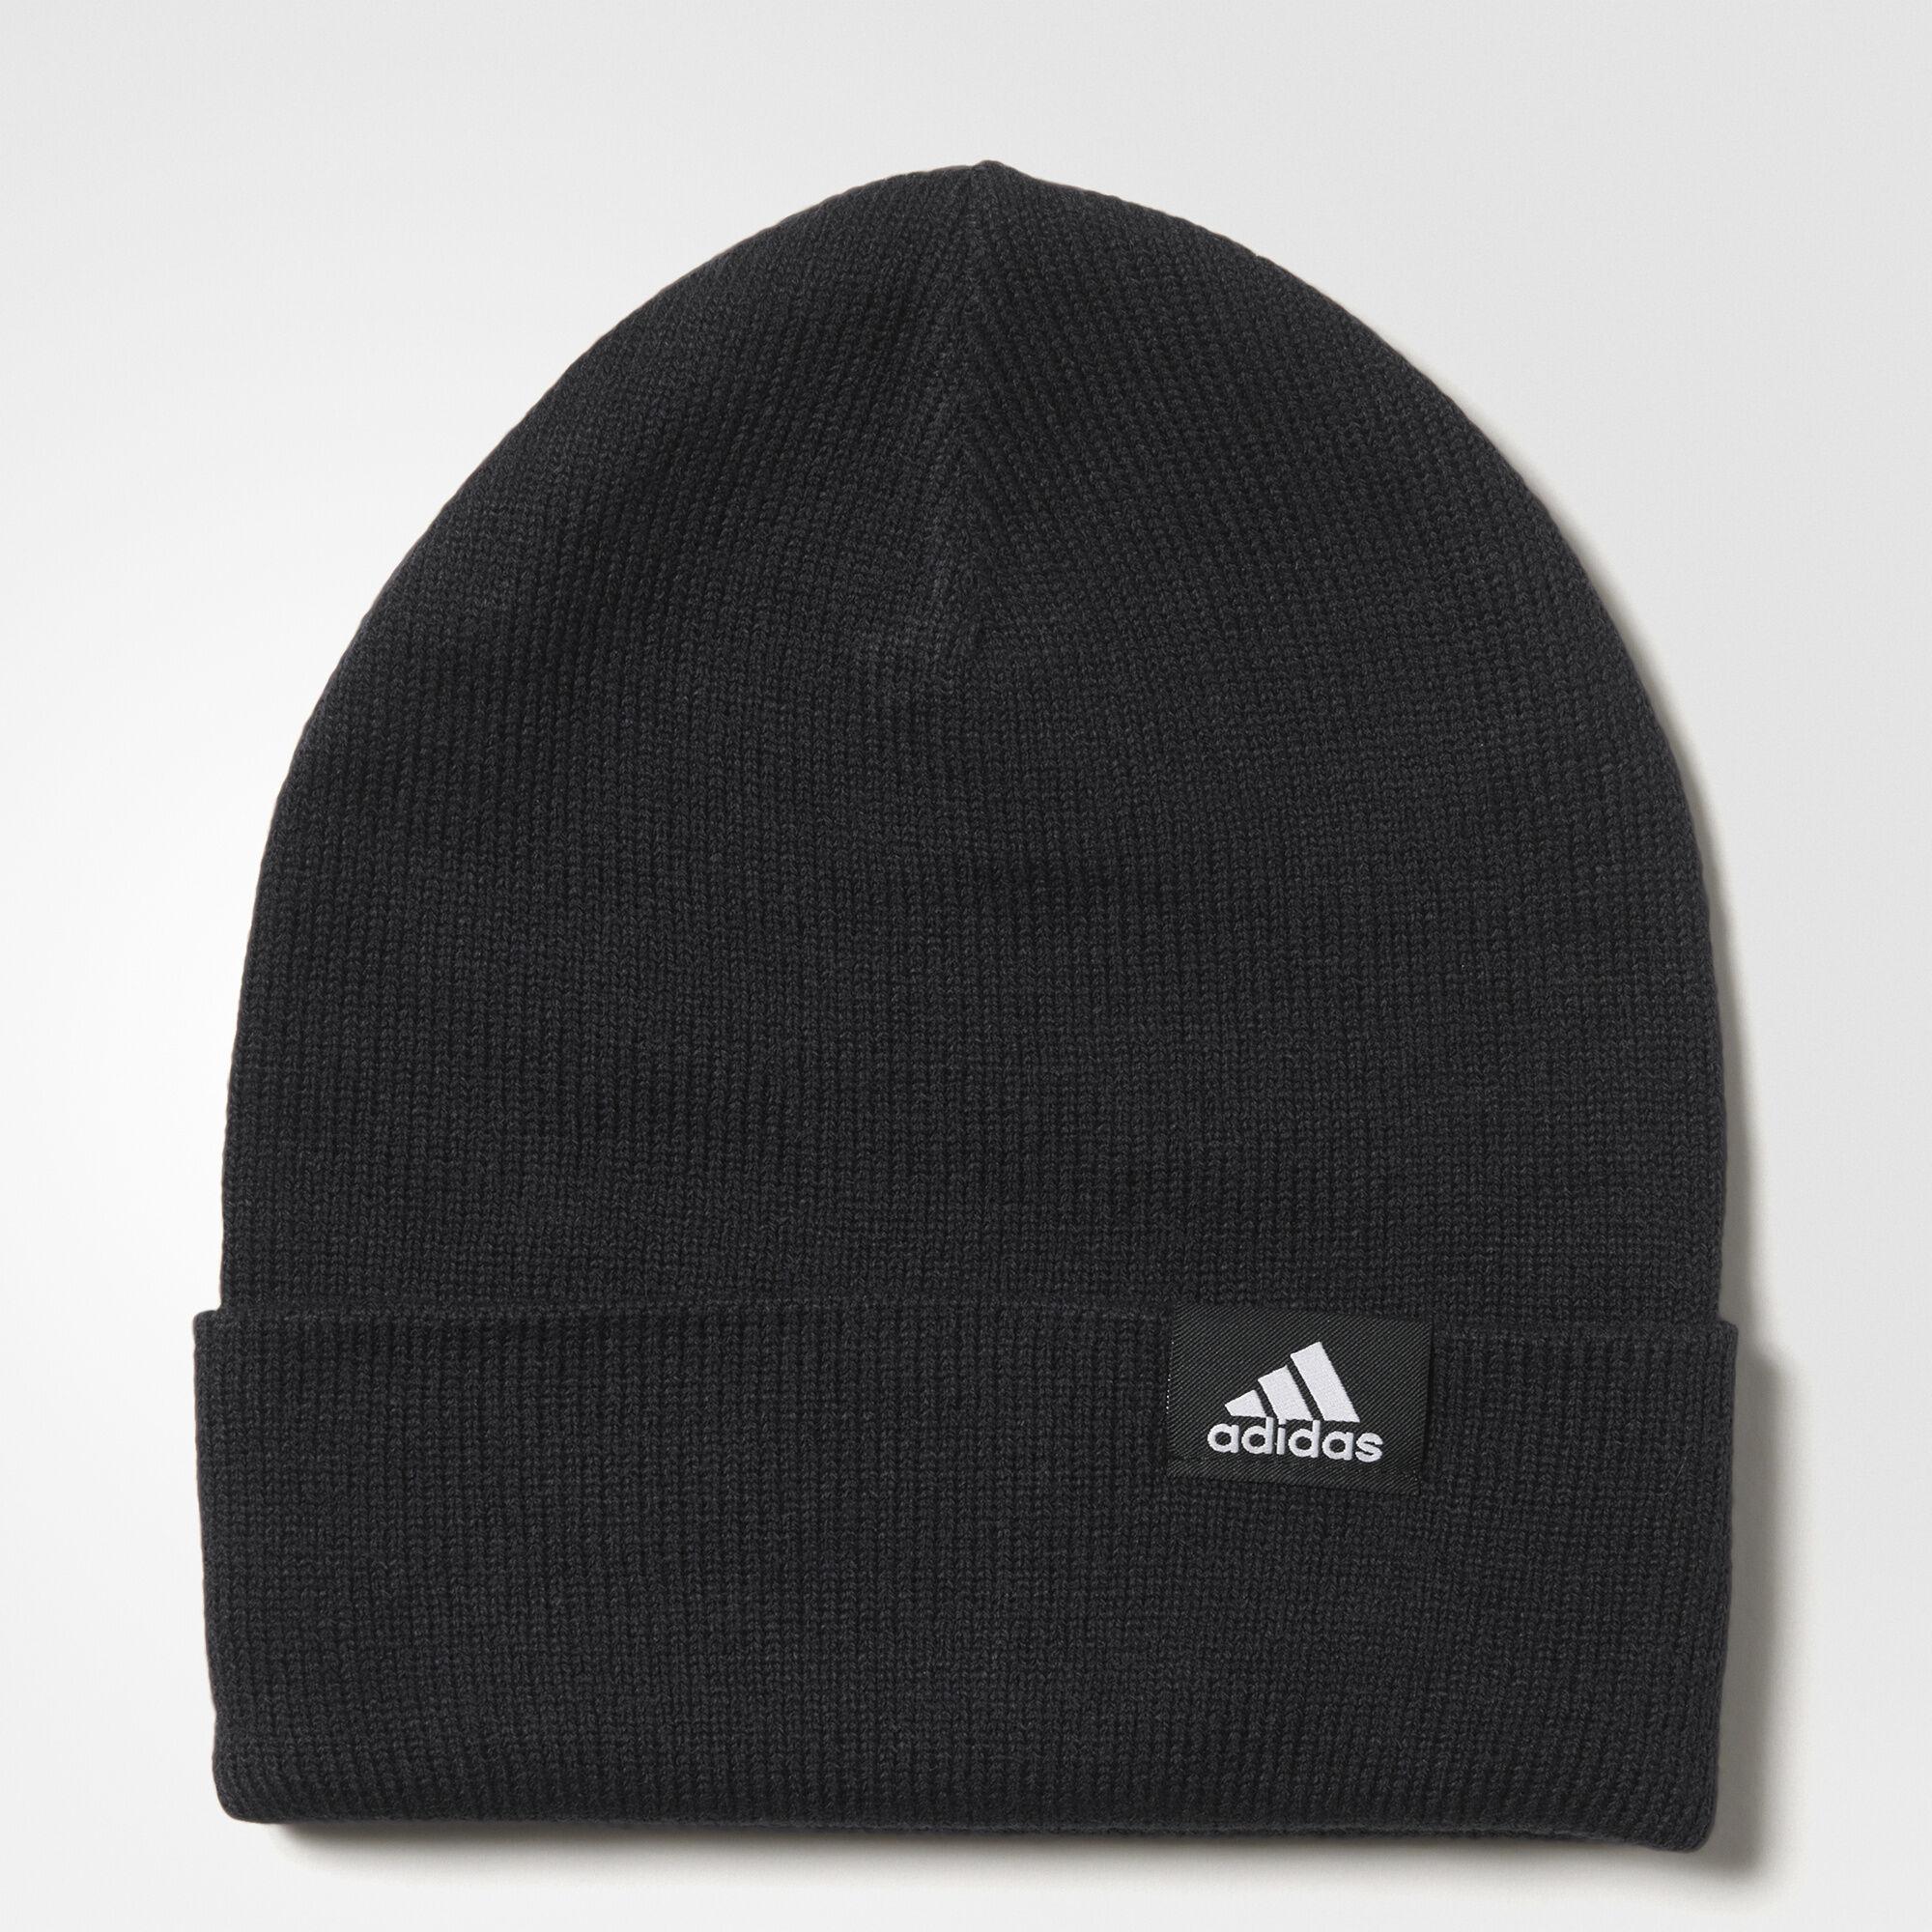 Cappello Adidas Invernale Nero